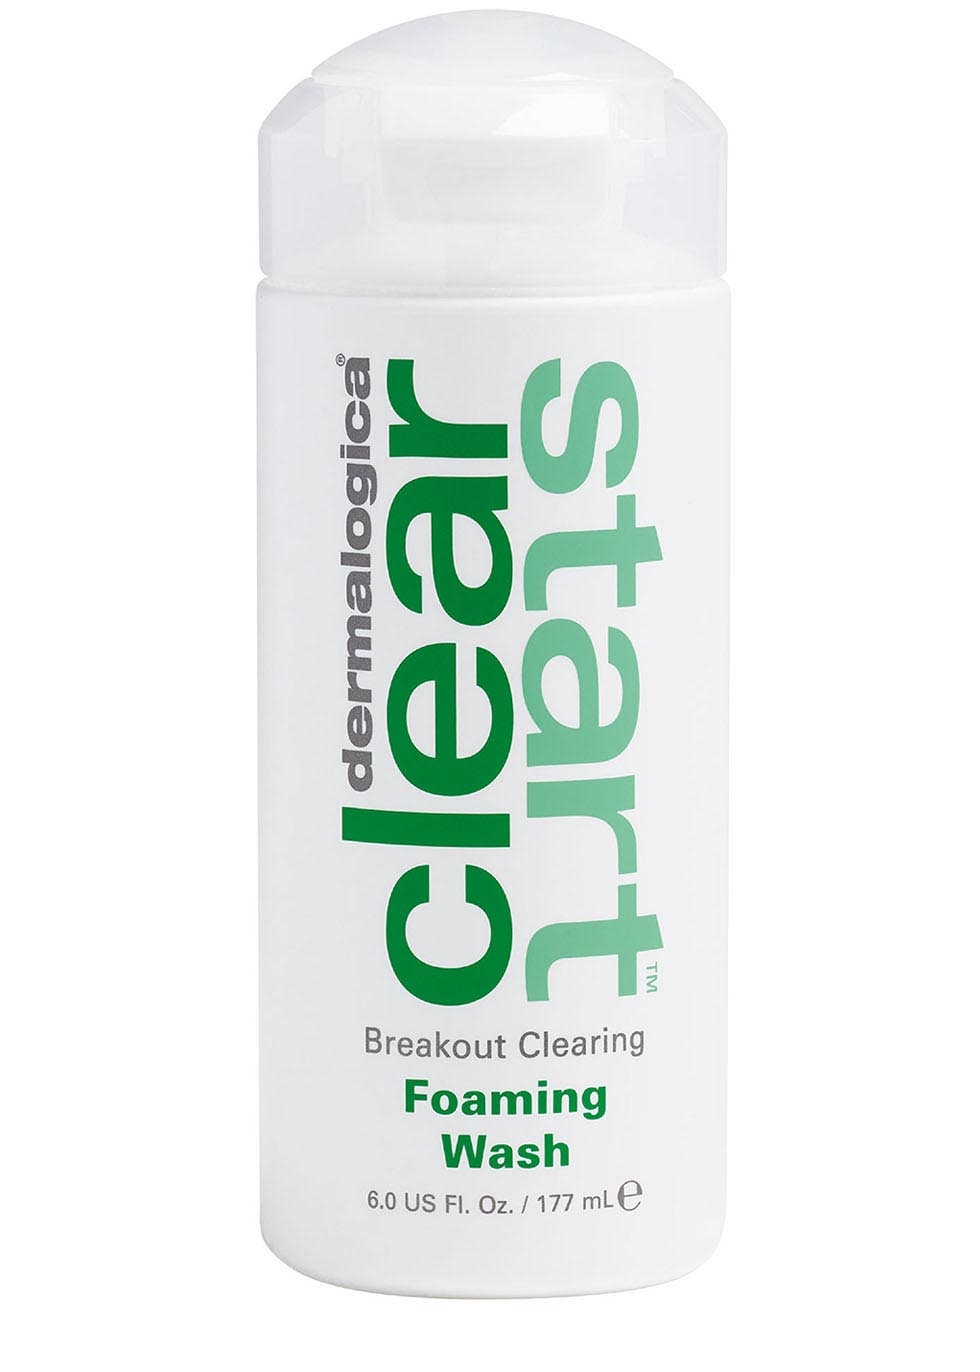 Breakout Clearing Foaming Wash 177ml